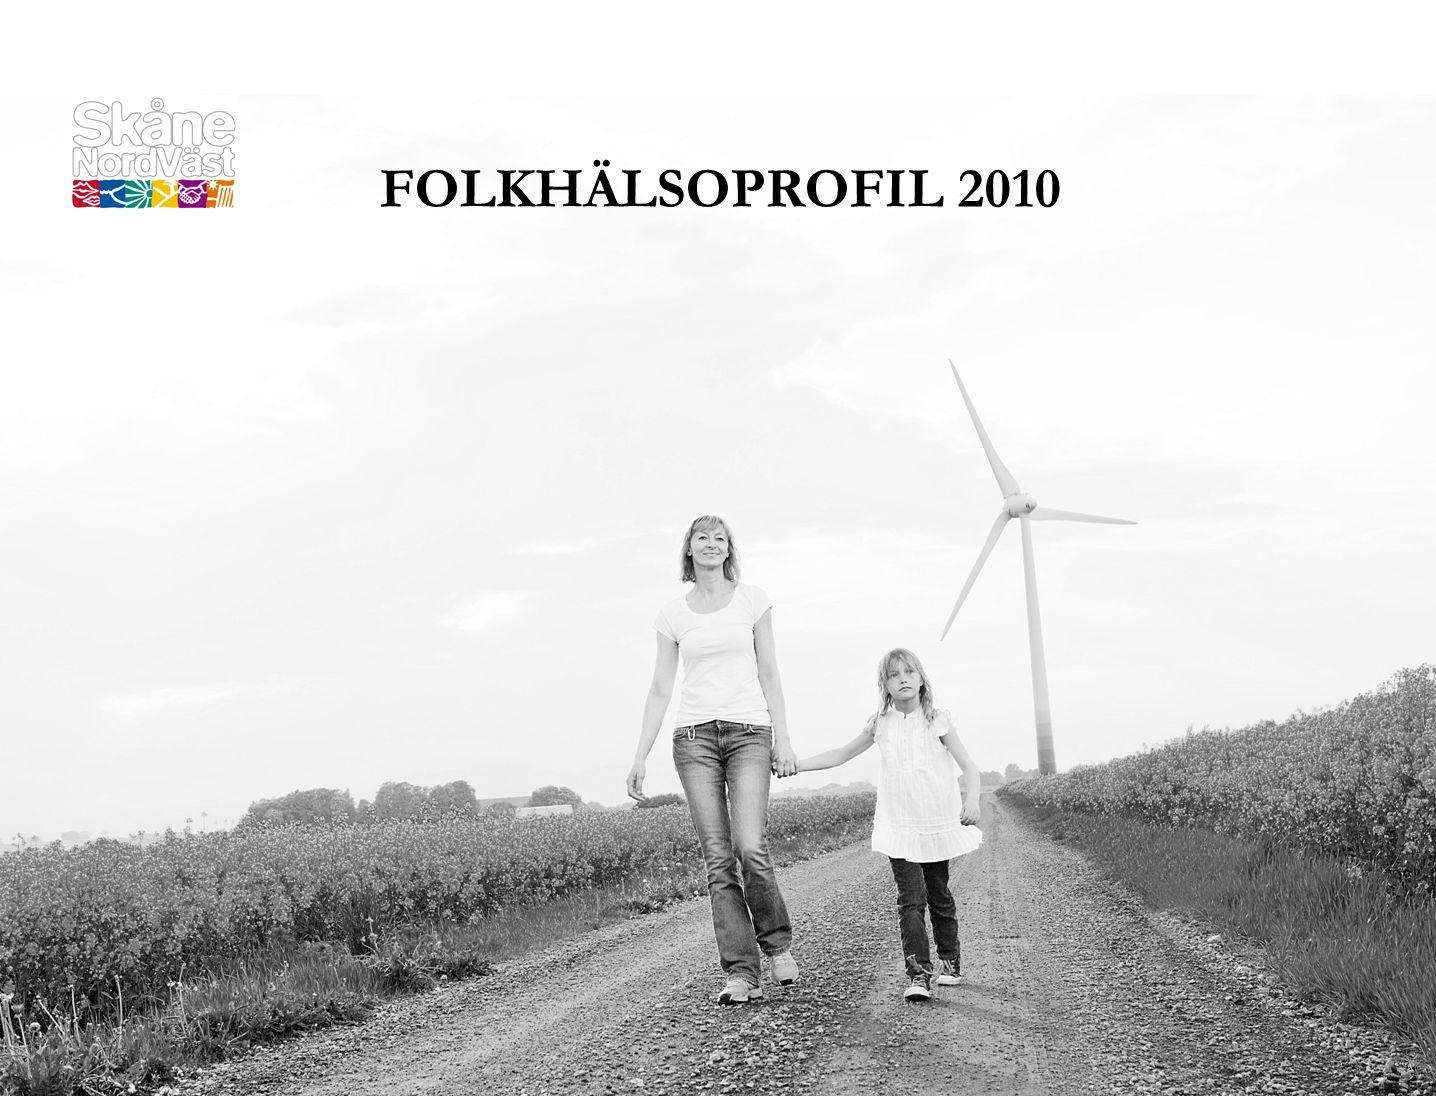 FOLKHÄLSOPROFIL 2010